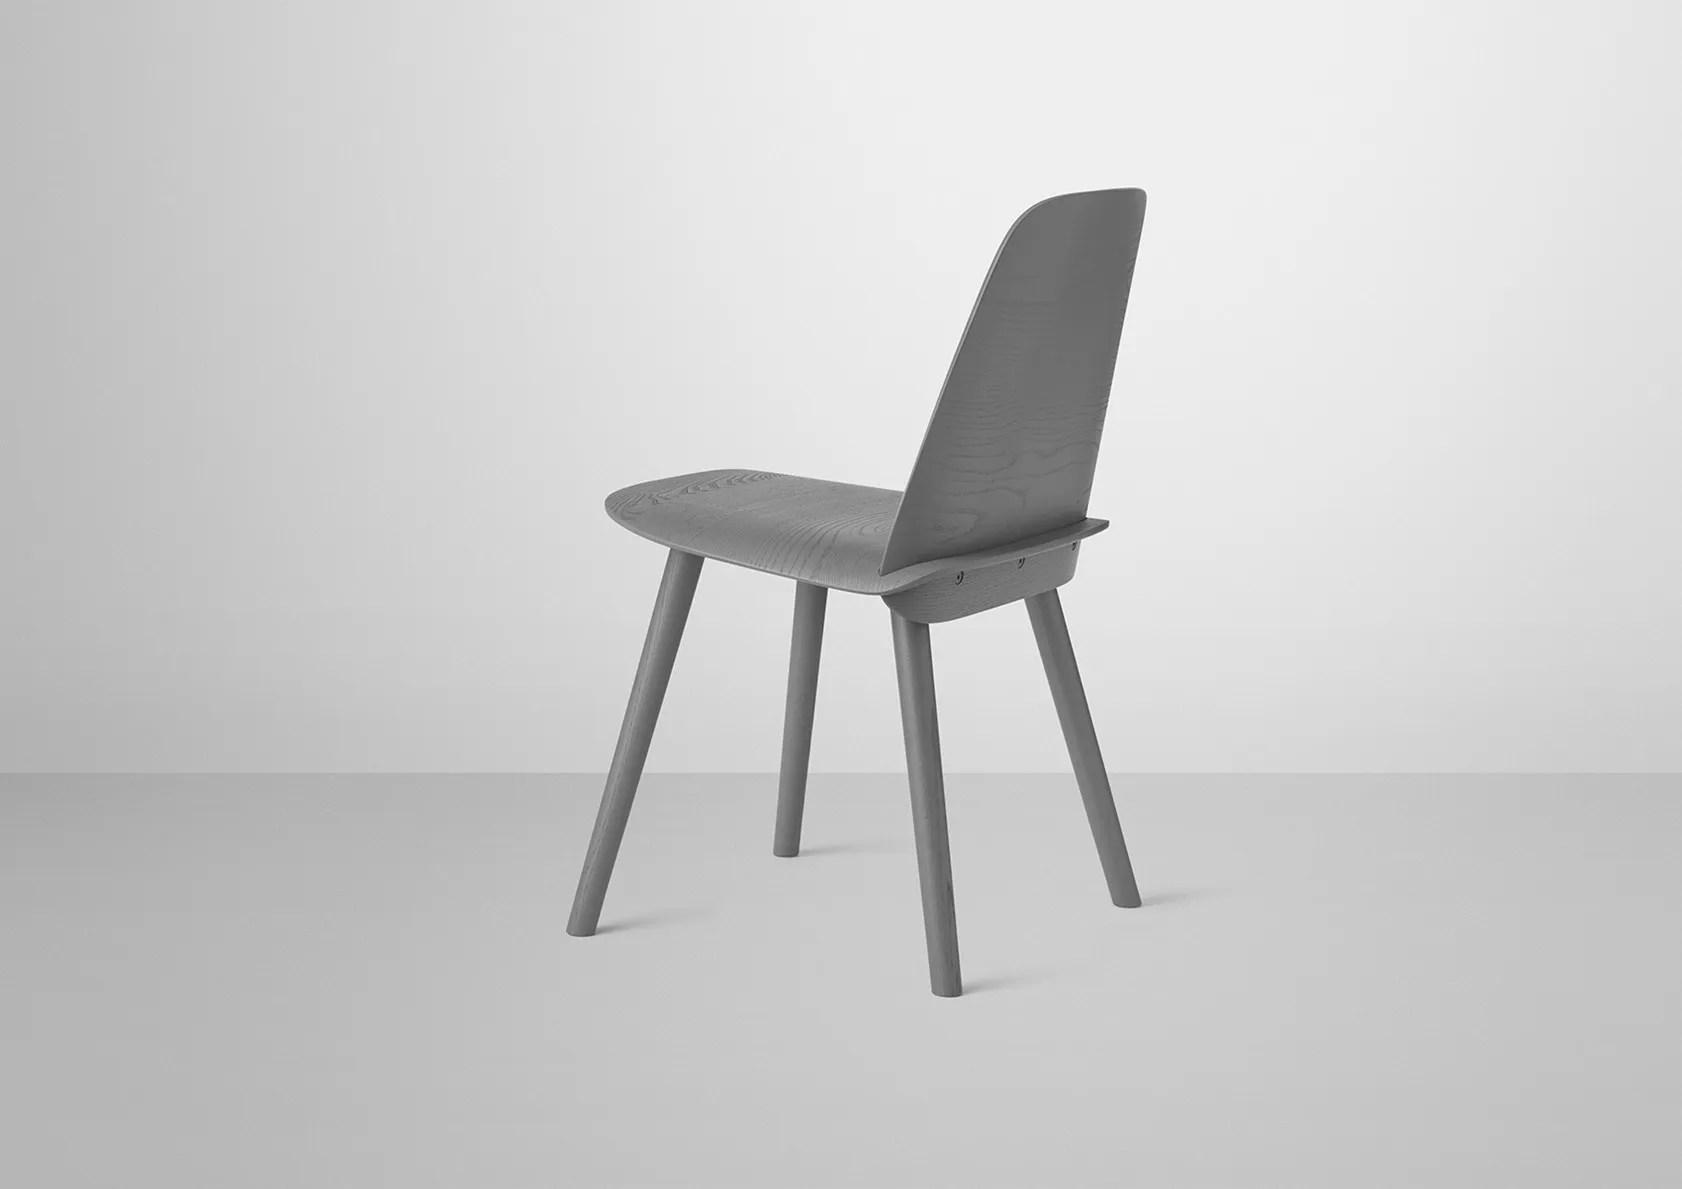 nerd chair muuto high top chairs muutos iconic wooden wears in dark grey